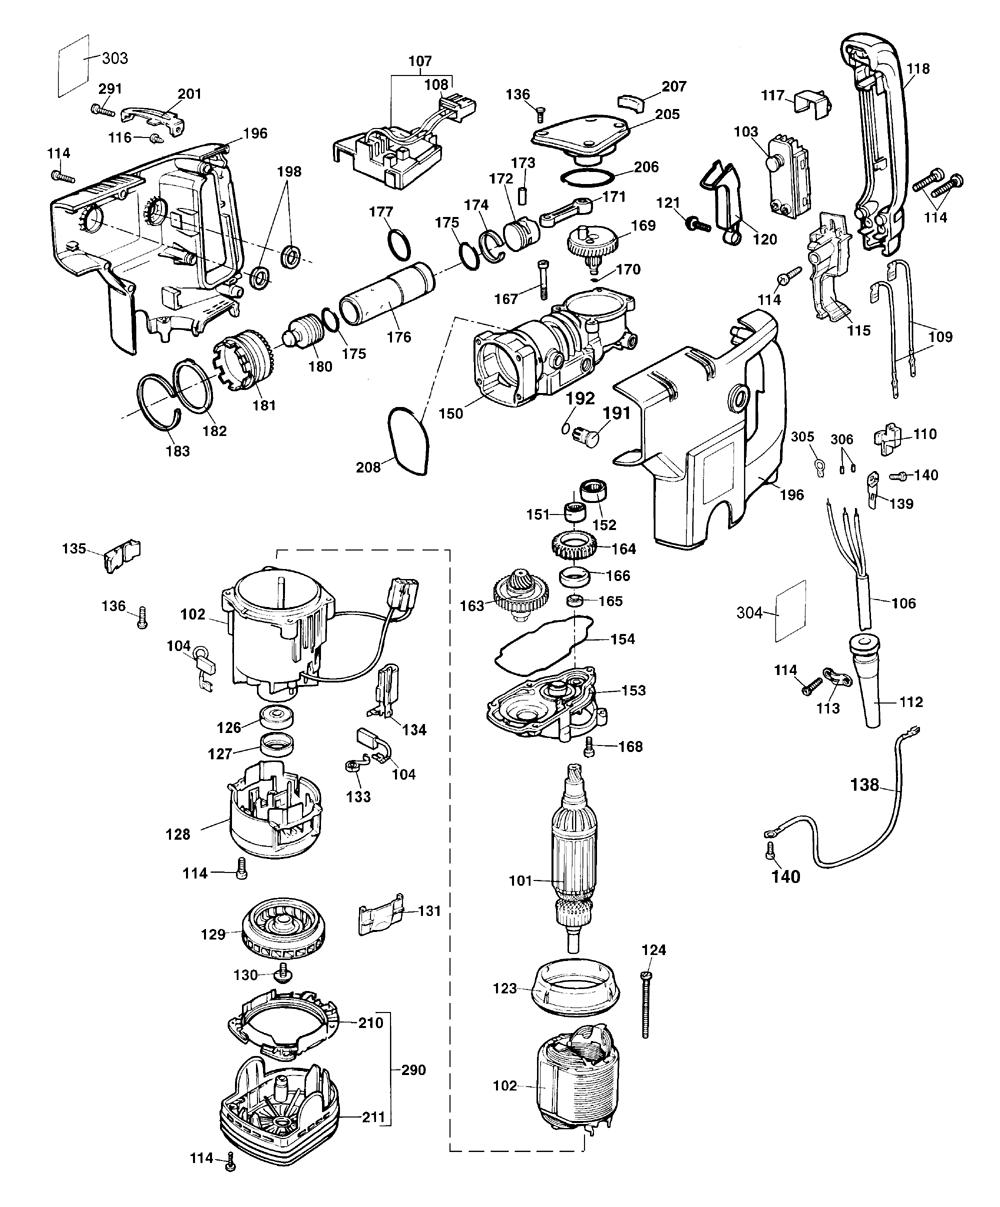 DW531K-Dewalt-T103-PB-1Break Down